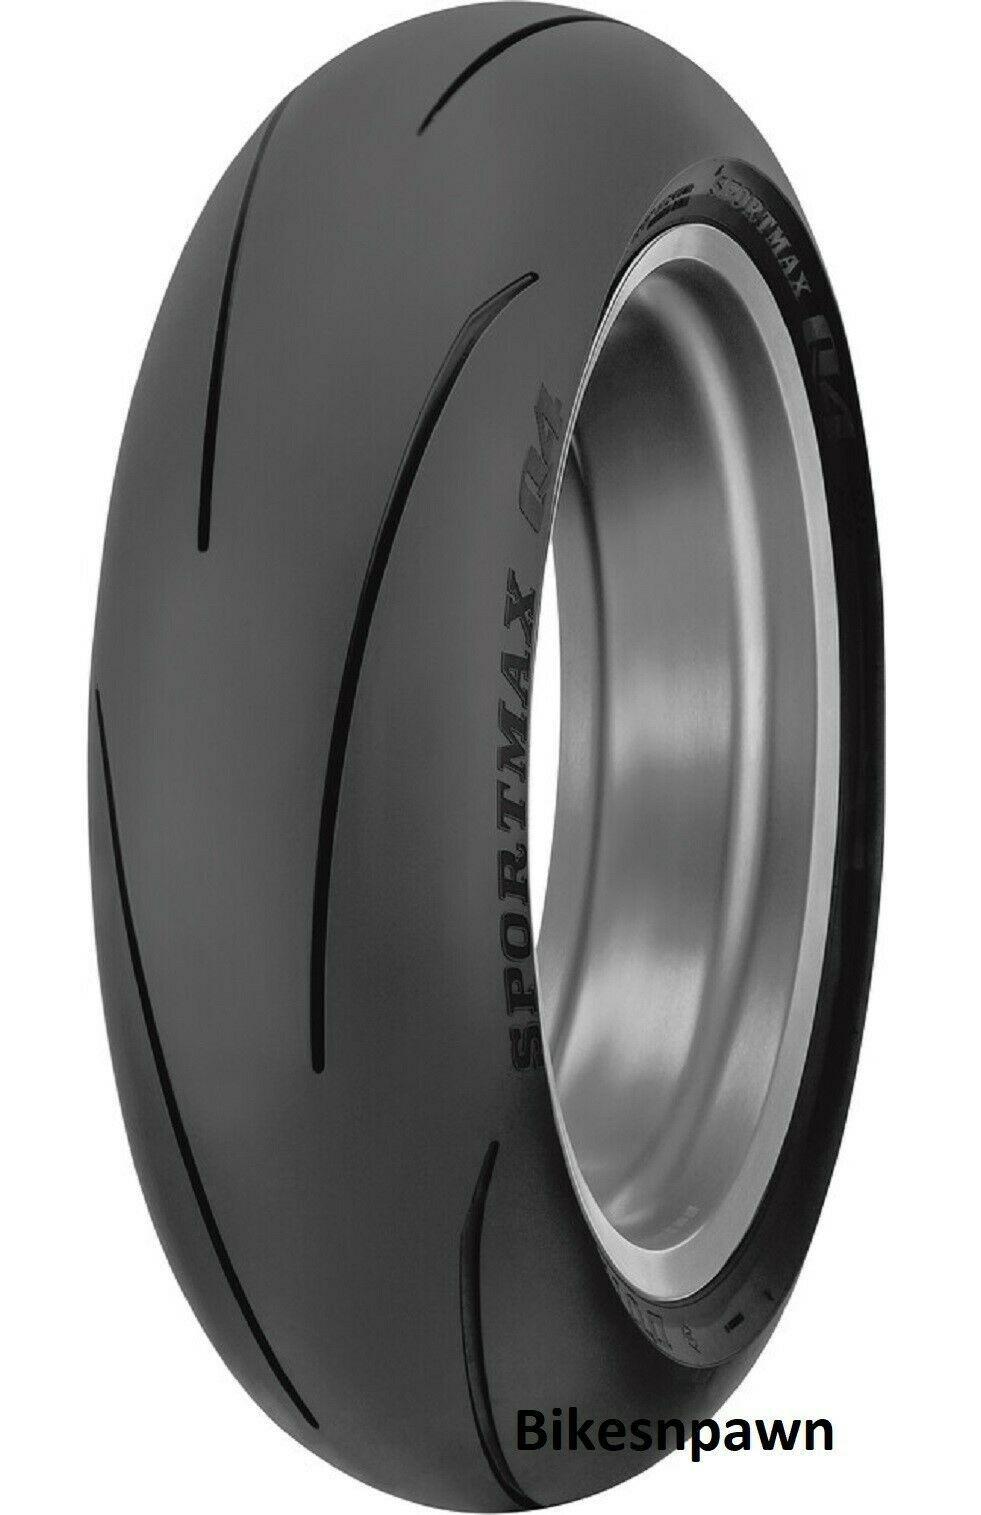 New 180/55ZR17 Dunlop Q4 Sportmax Rear Radial Motorcycle Tire 73W TL